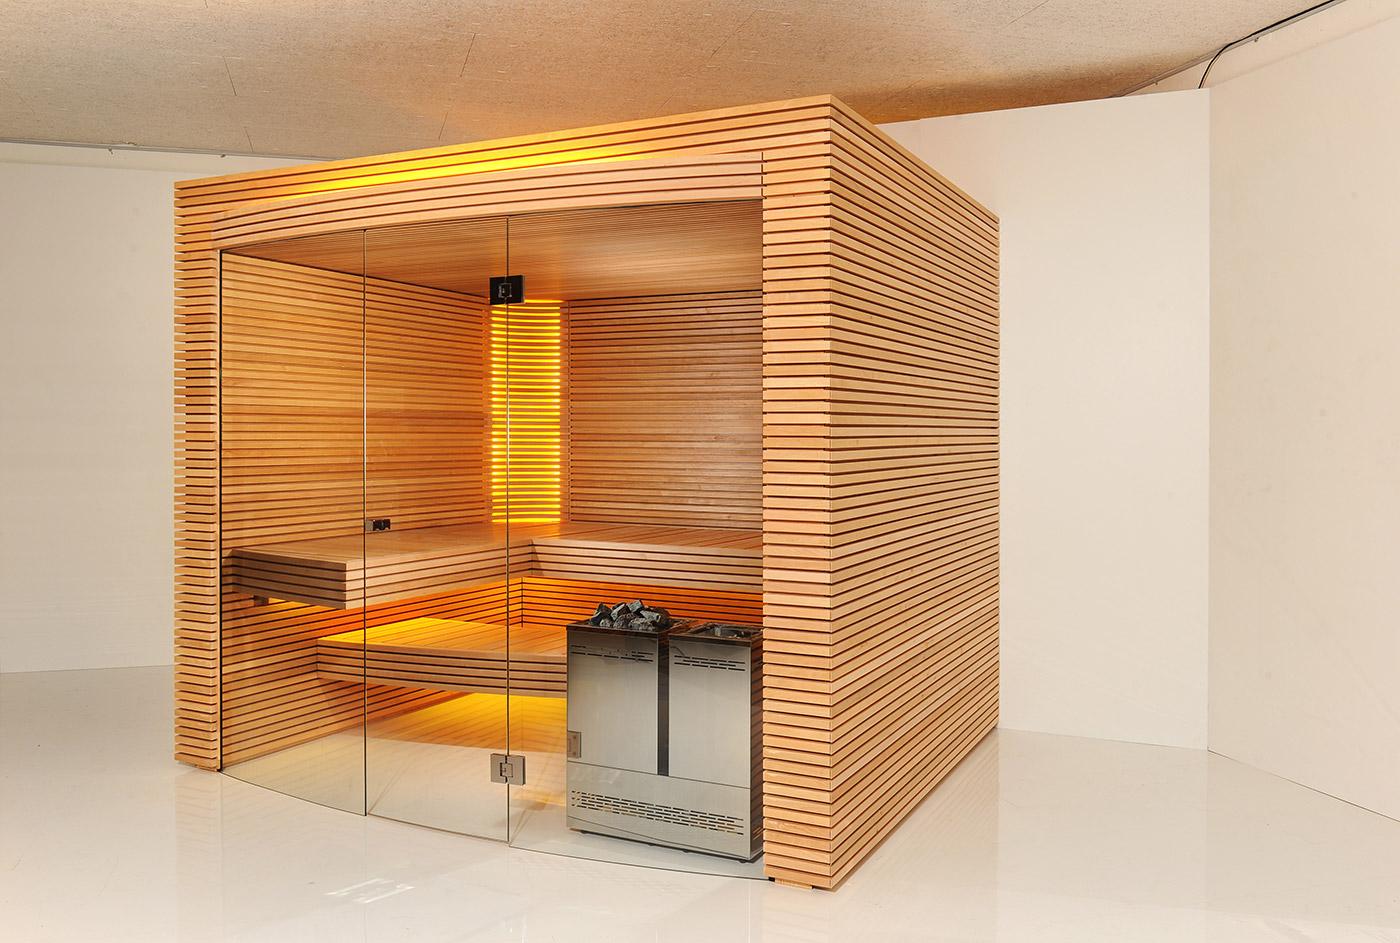 Swiss home sauna Ovola-side view